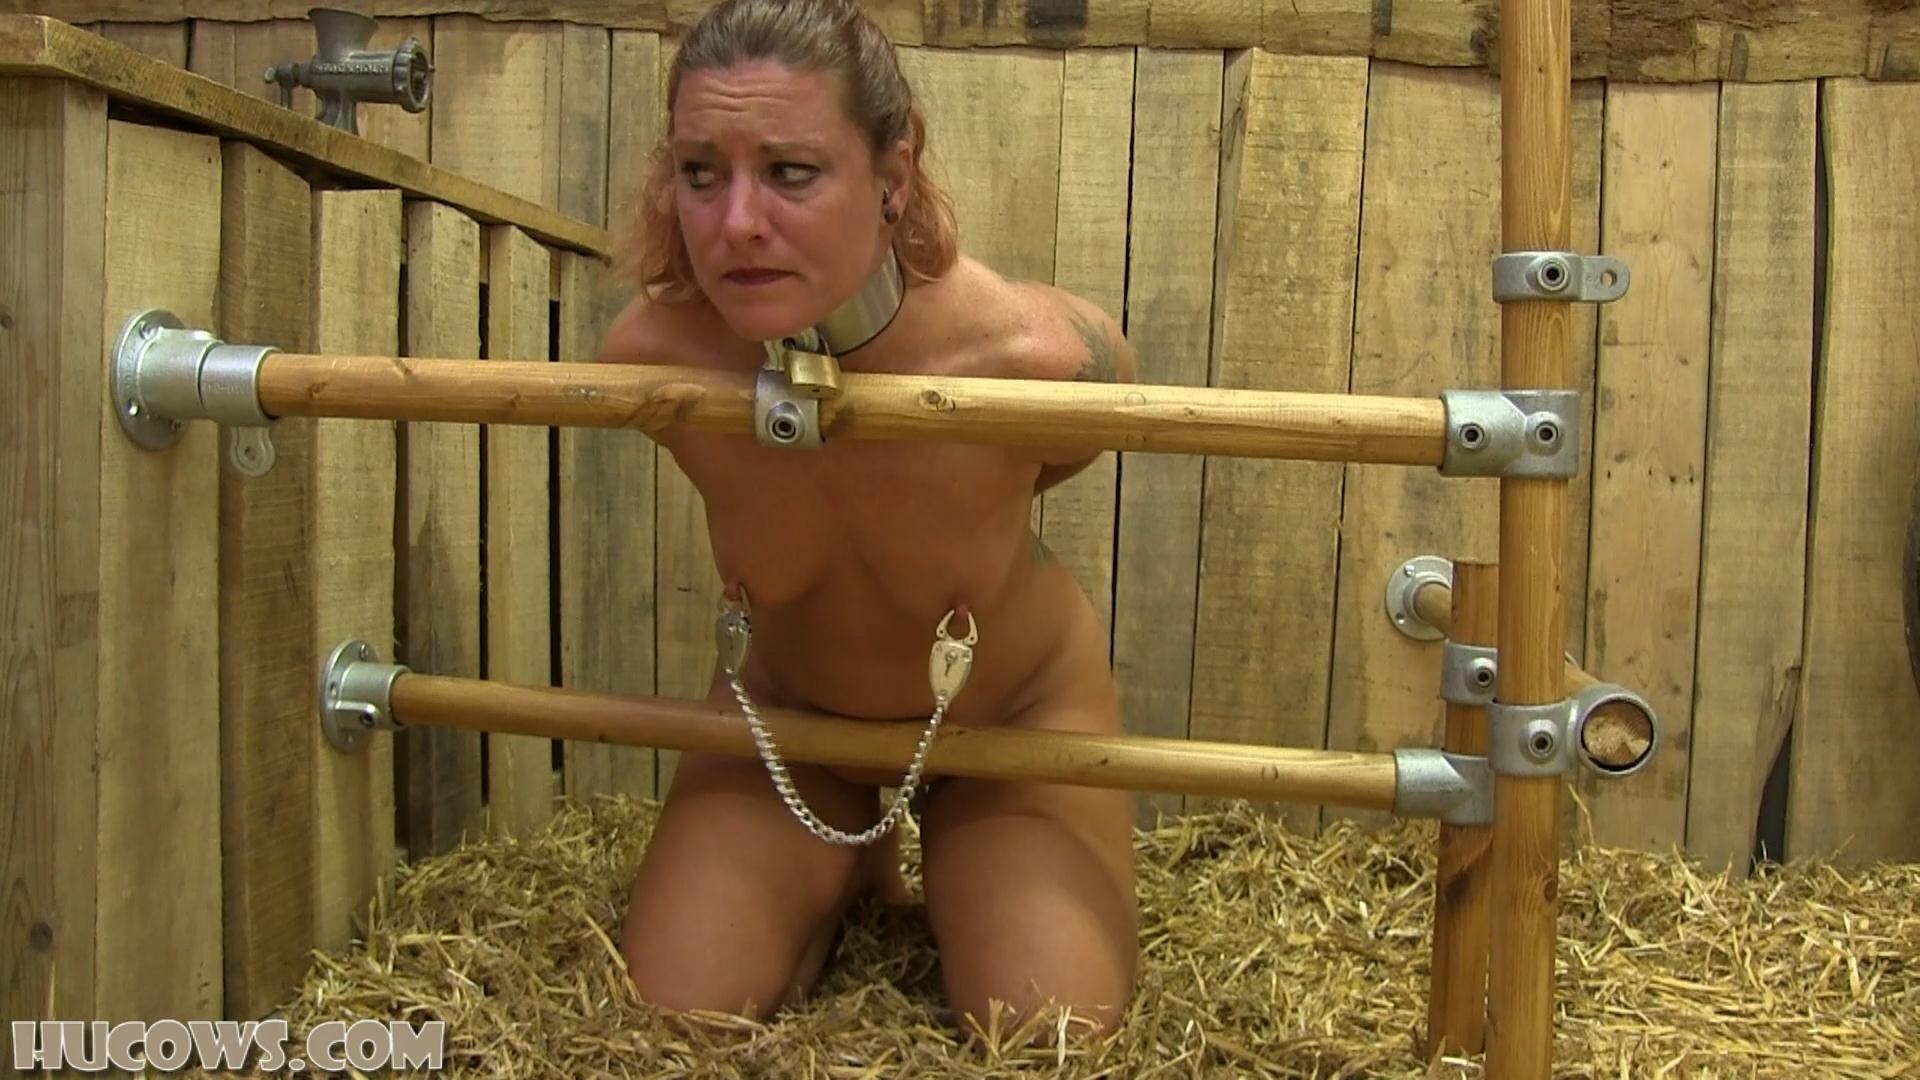 Maid mira tease and milk bondage slave free porn sex